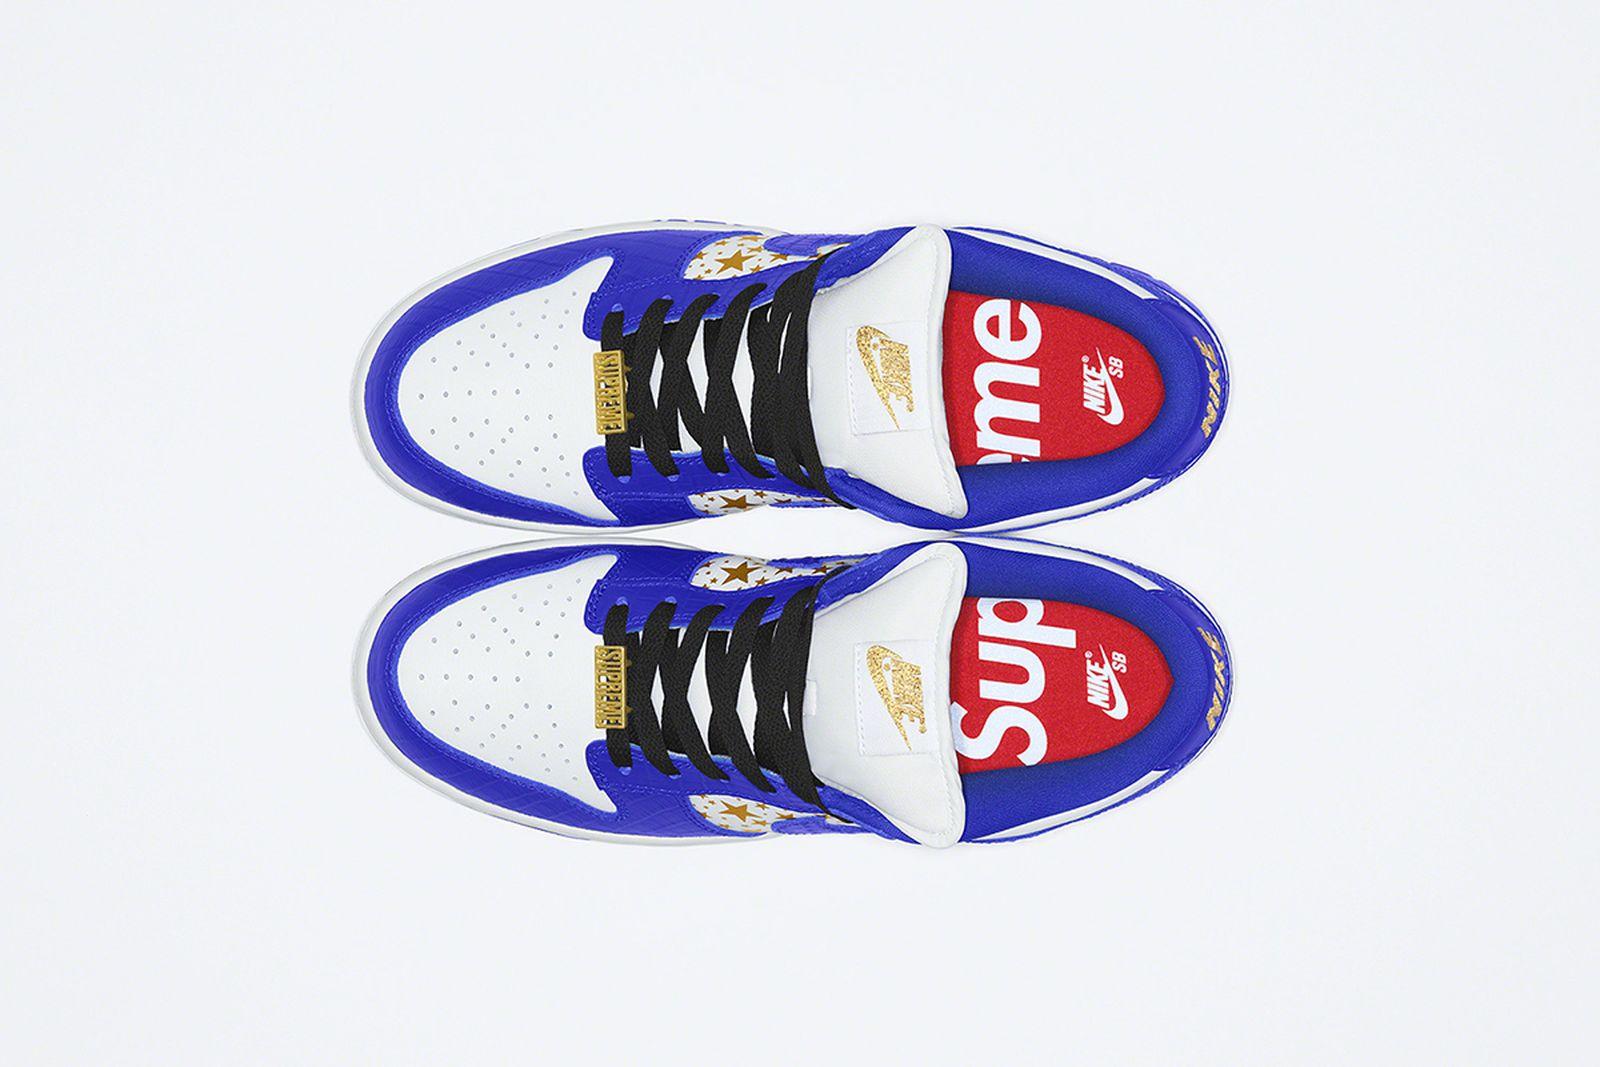 supreme-nike-sb-dunk-low-hyper-blue-release-date-price-09